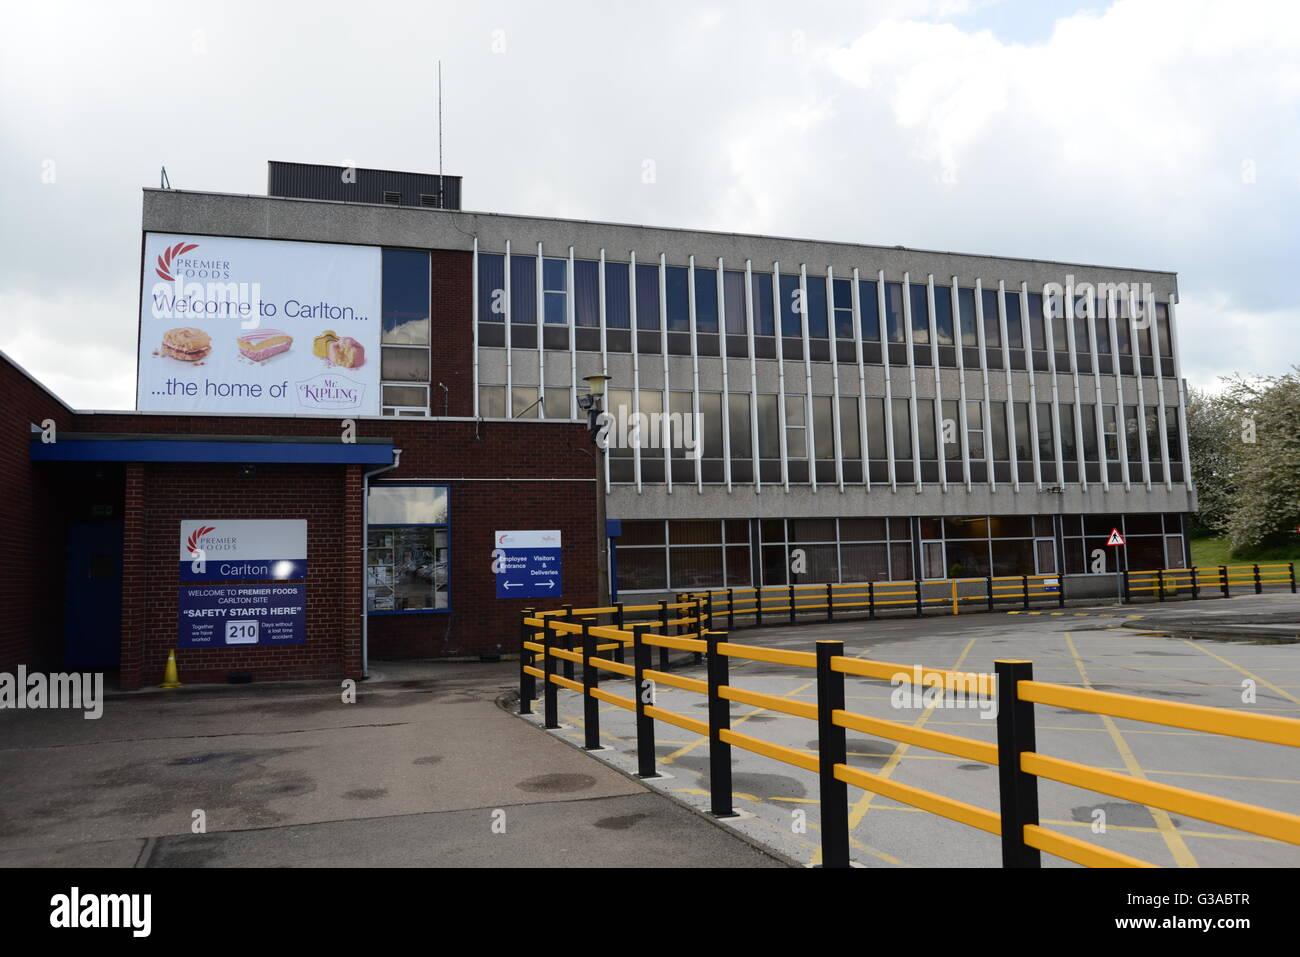 Premier Foods Factory Carlton Barnsley South Yorkshire